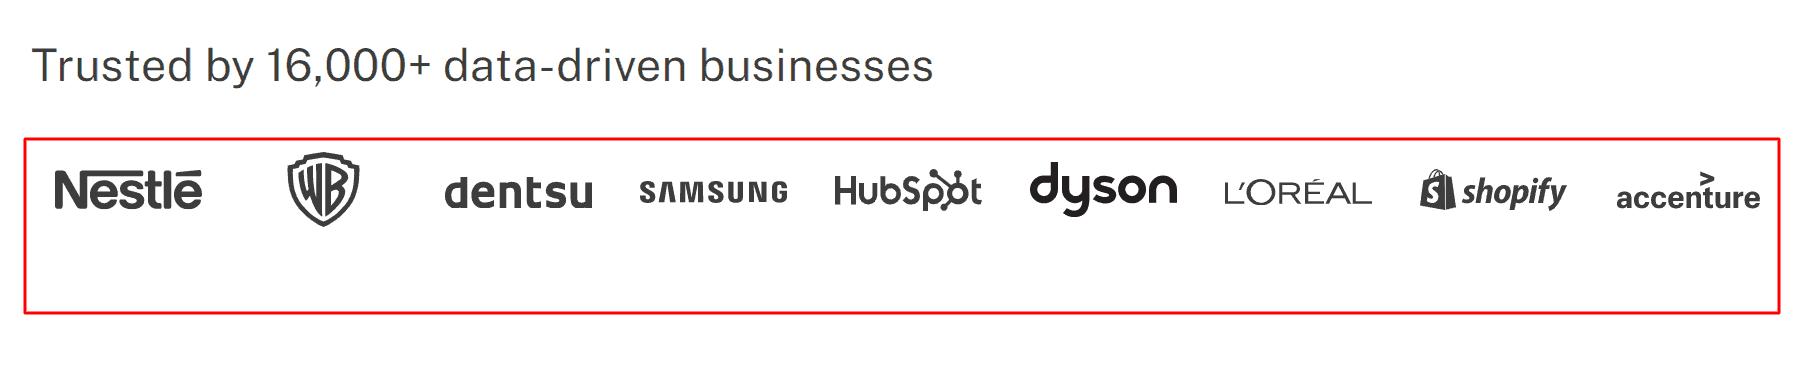 Supermetrics trusted brands